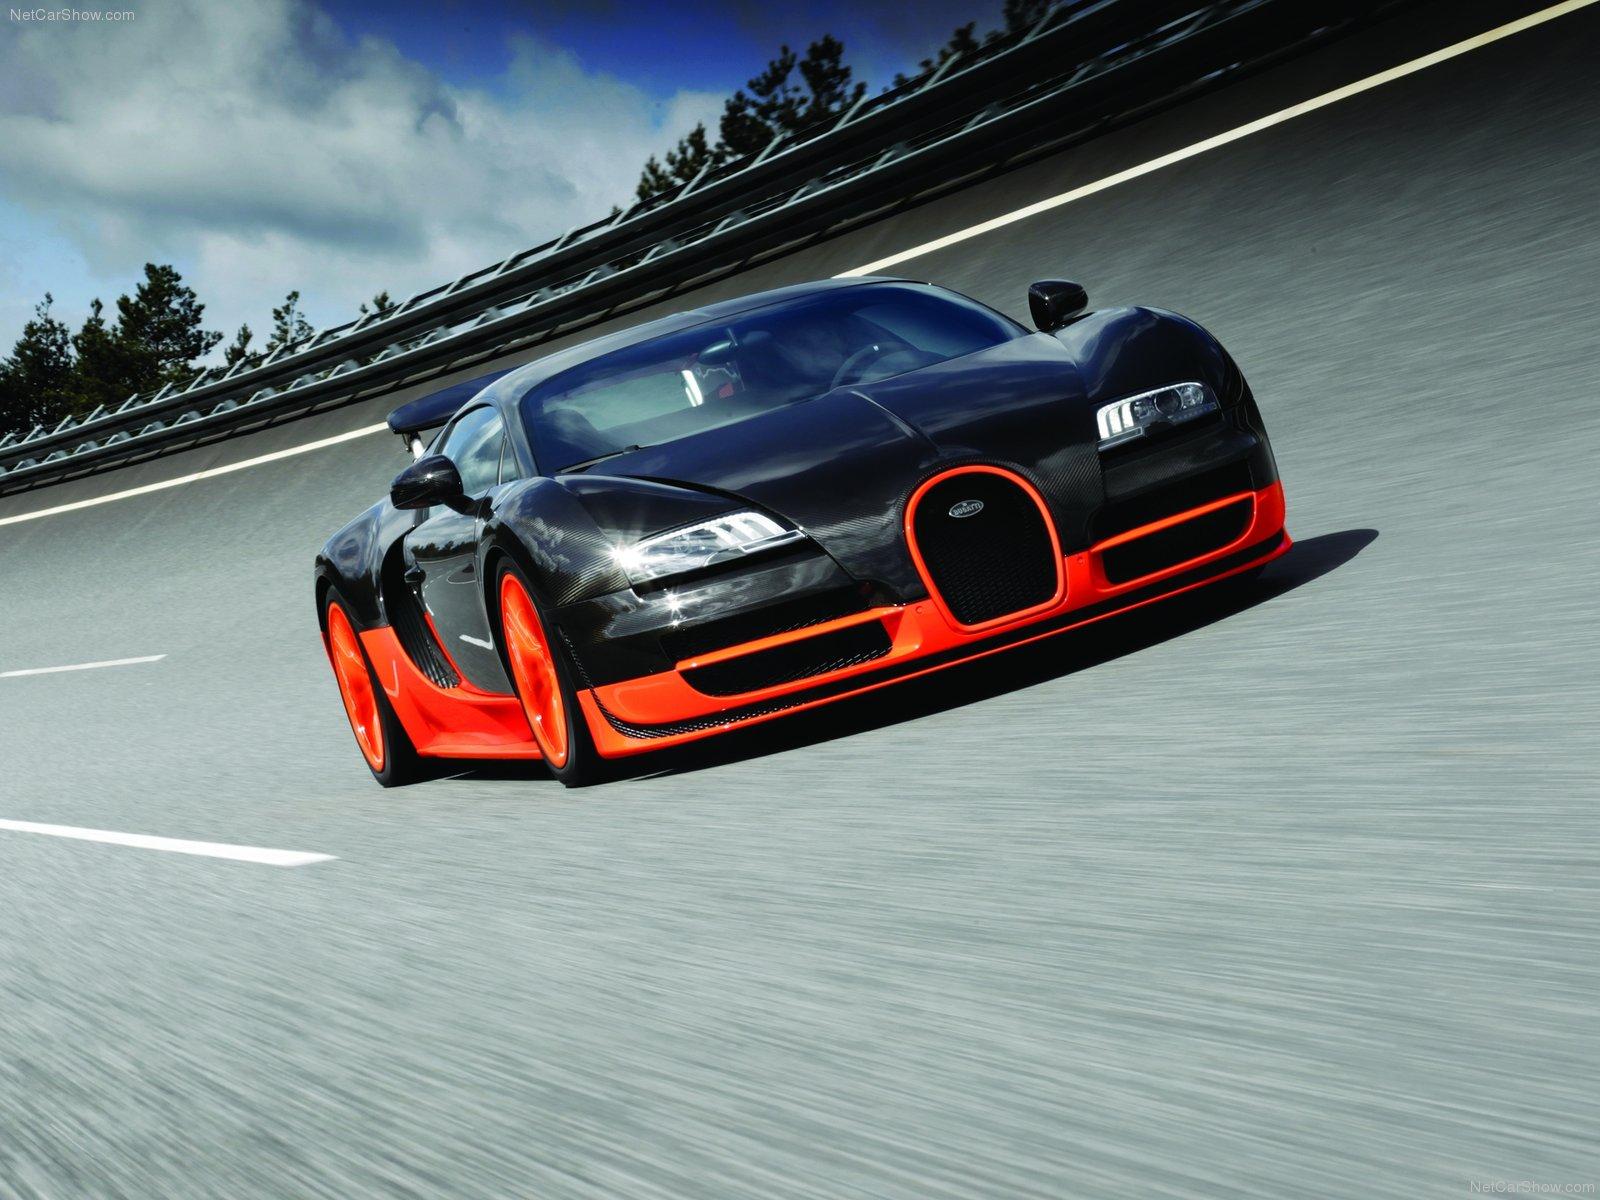 Bugatti-Veyron_Super_Sport_2011_1600x1200_wallpaper_02 Outstanding Bugatti Veyron Price In Kolkata Cars Trend